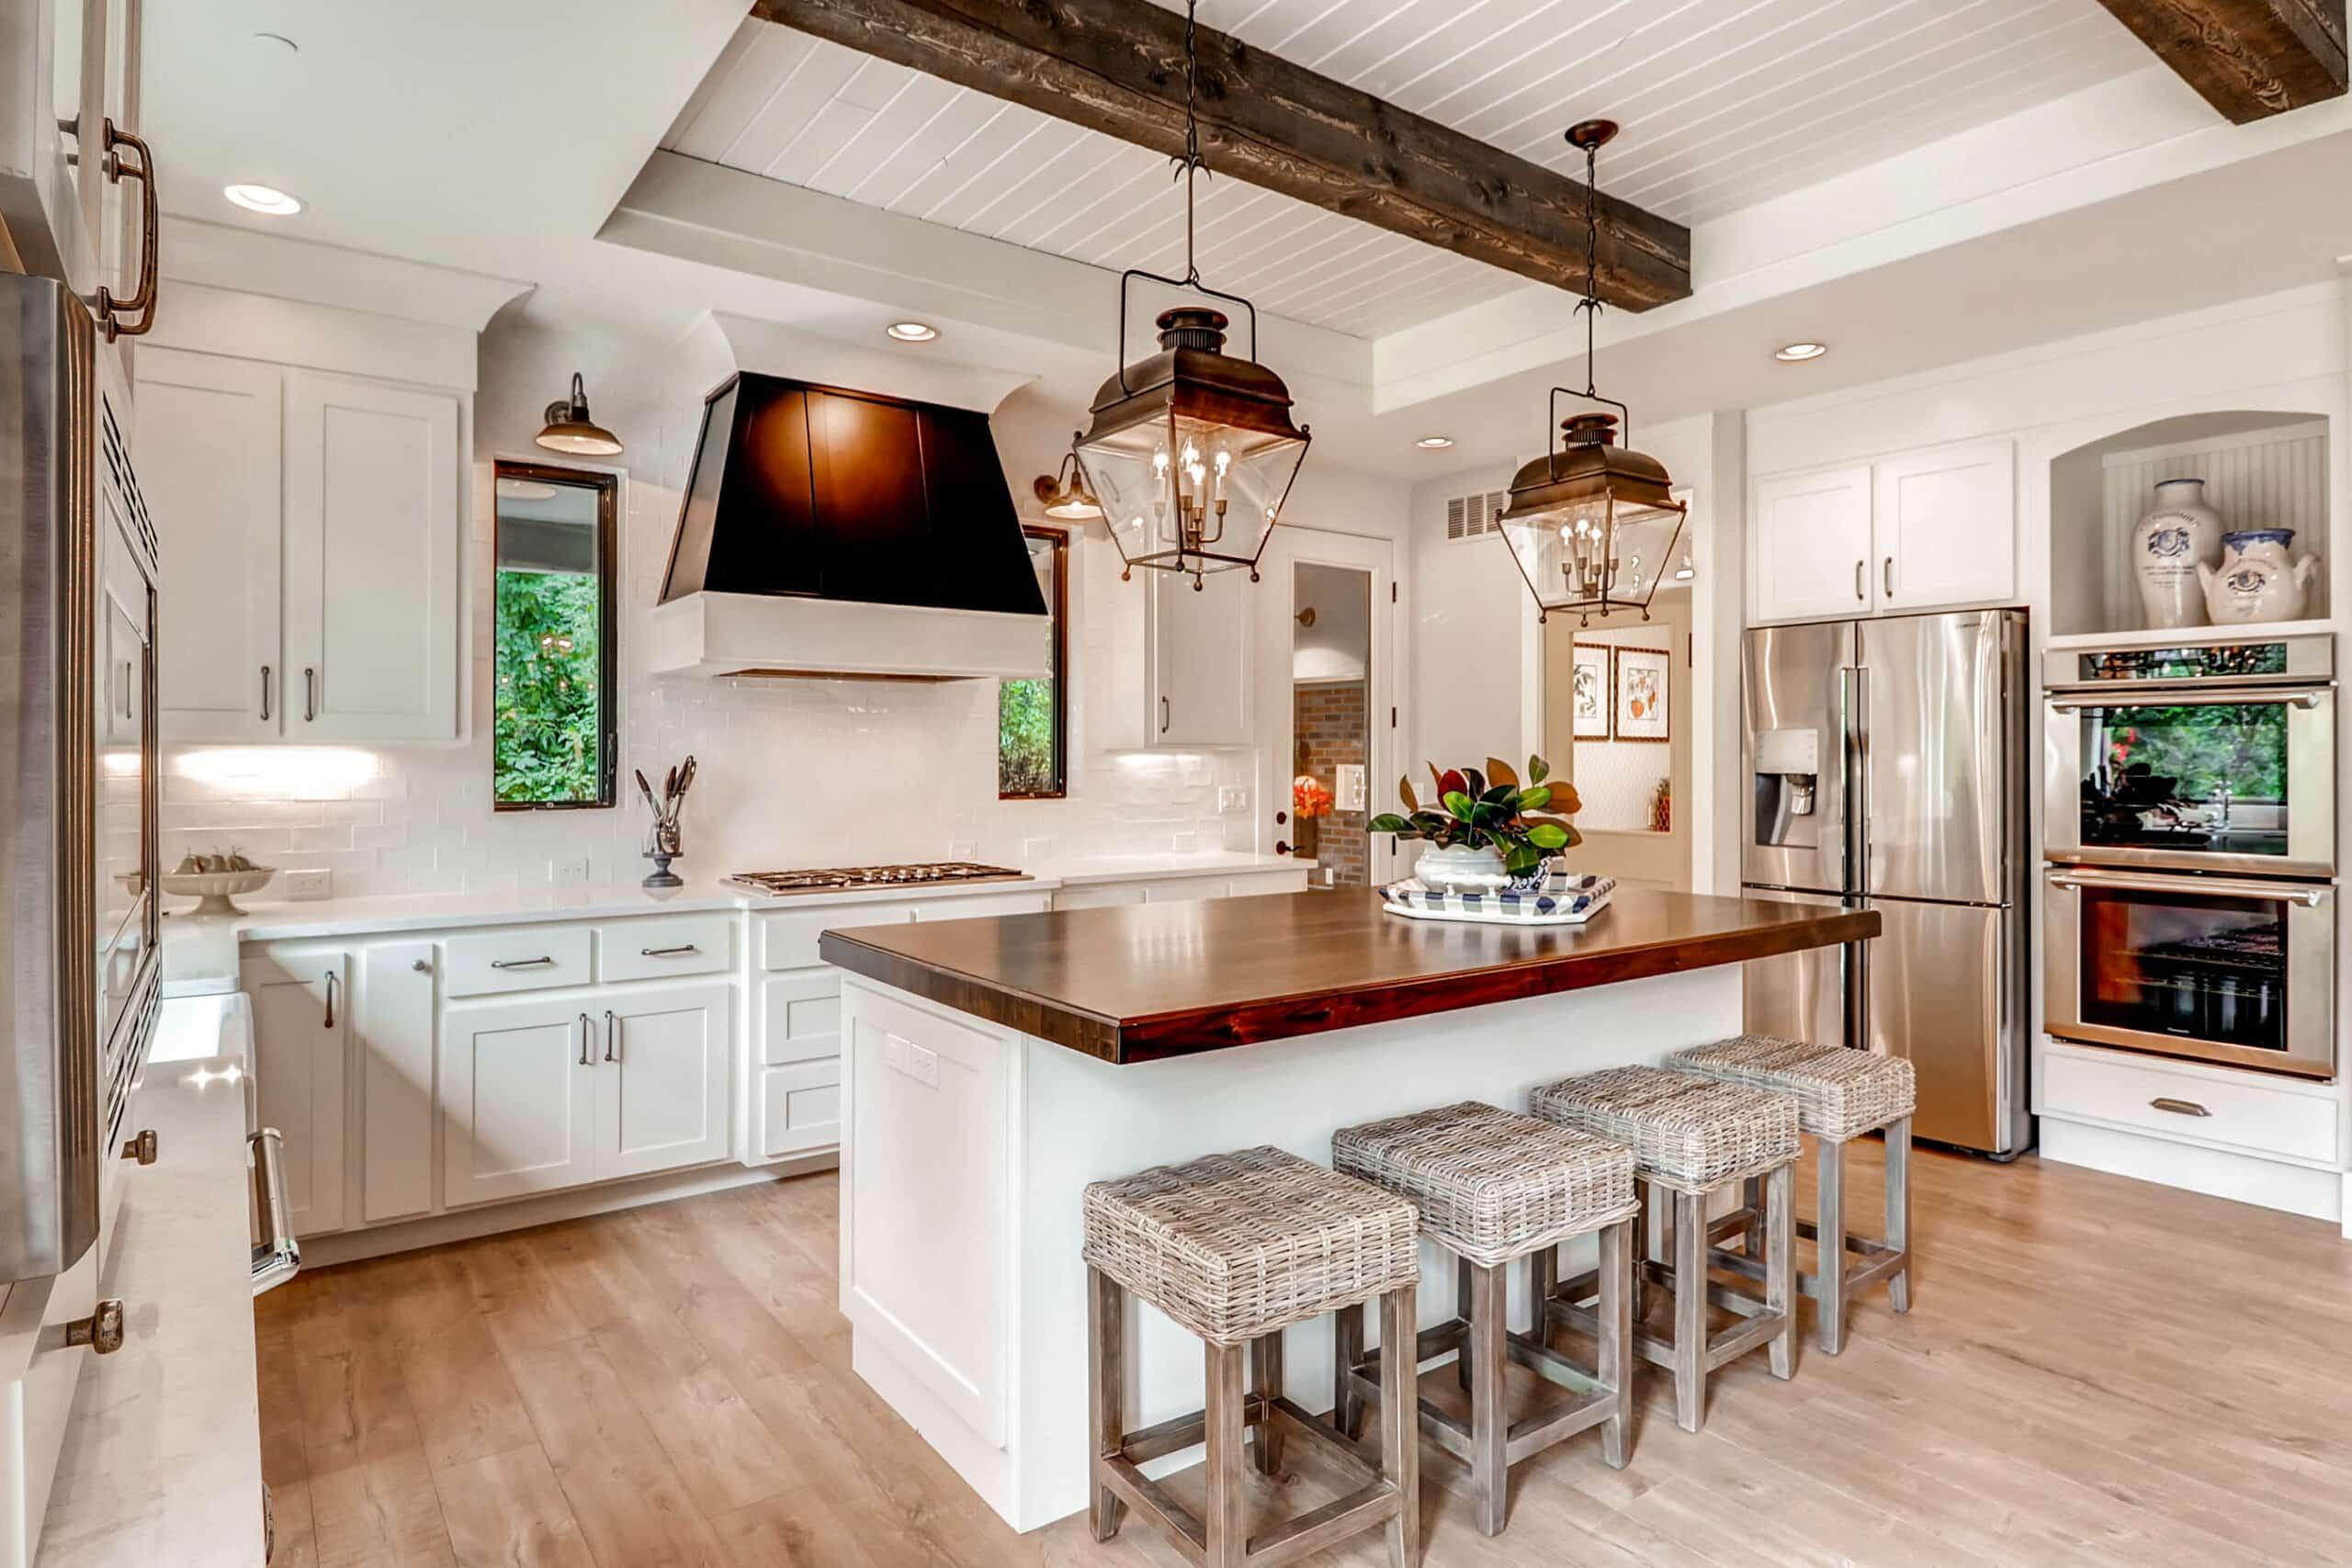 5 laminates perfect for a unique farmhouse kitchen farmhouse kitchen lighting 5 Laminates Perfect for a Unique Farmhouse Kitchen